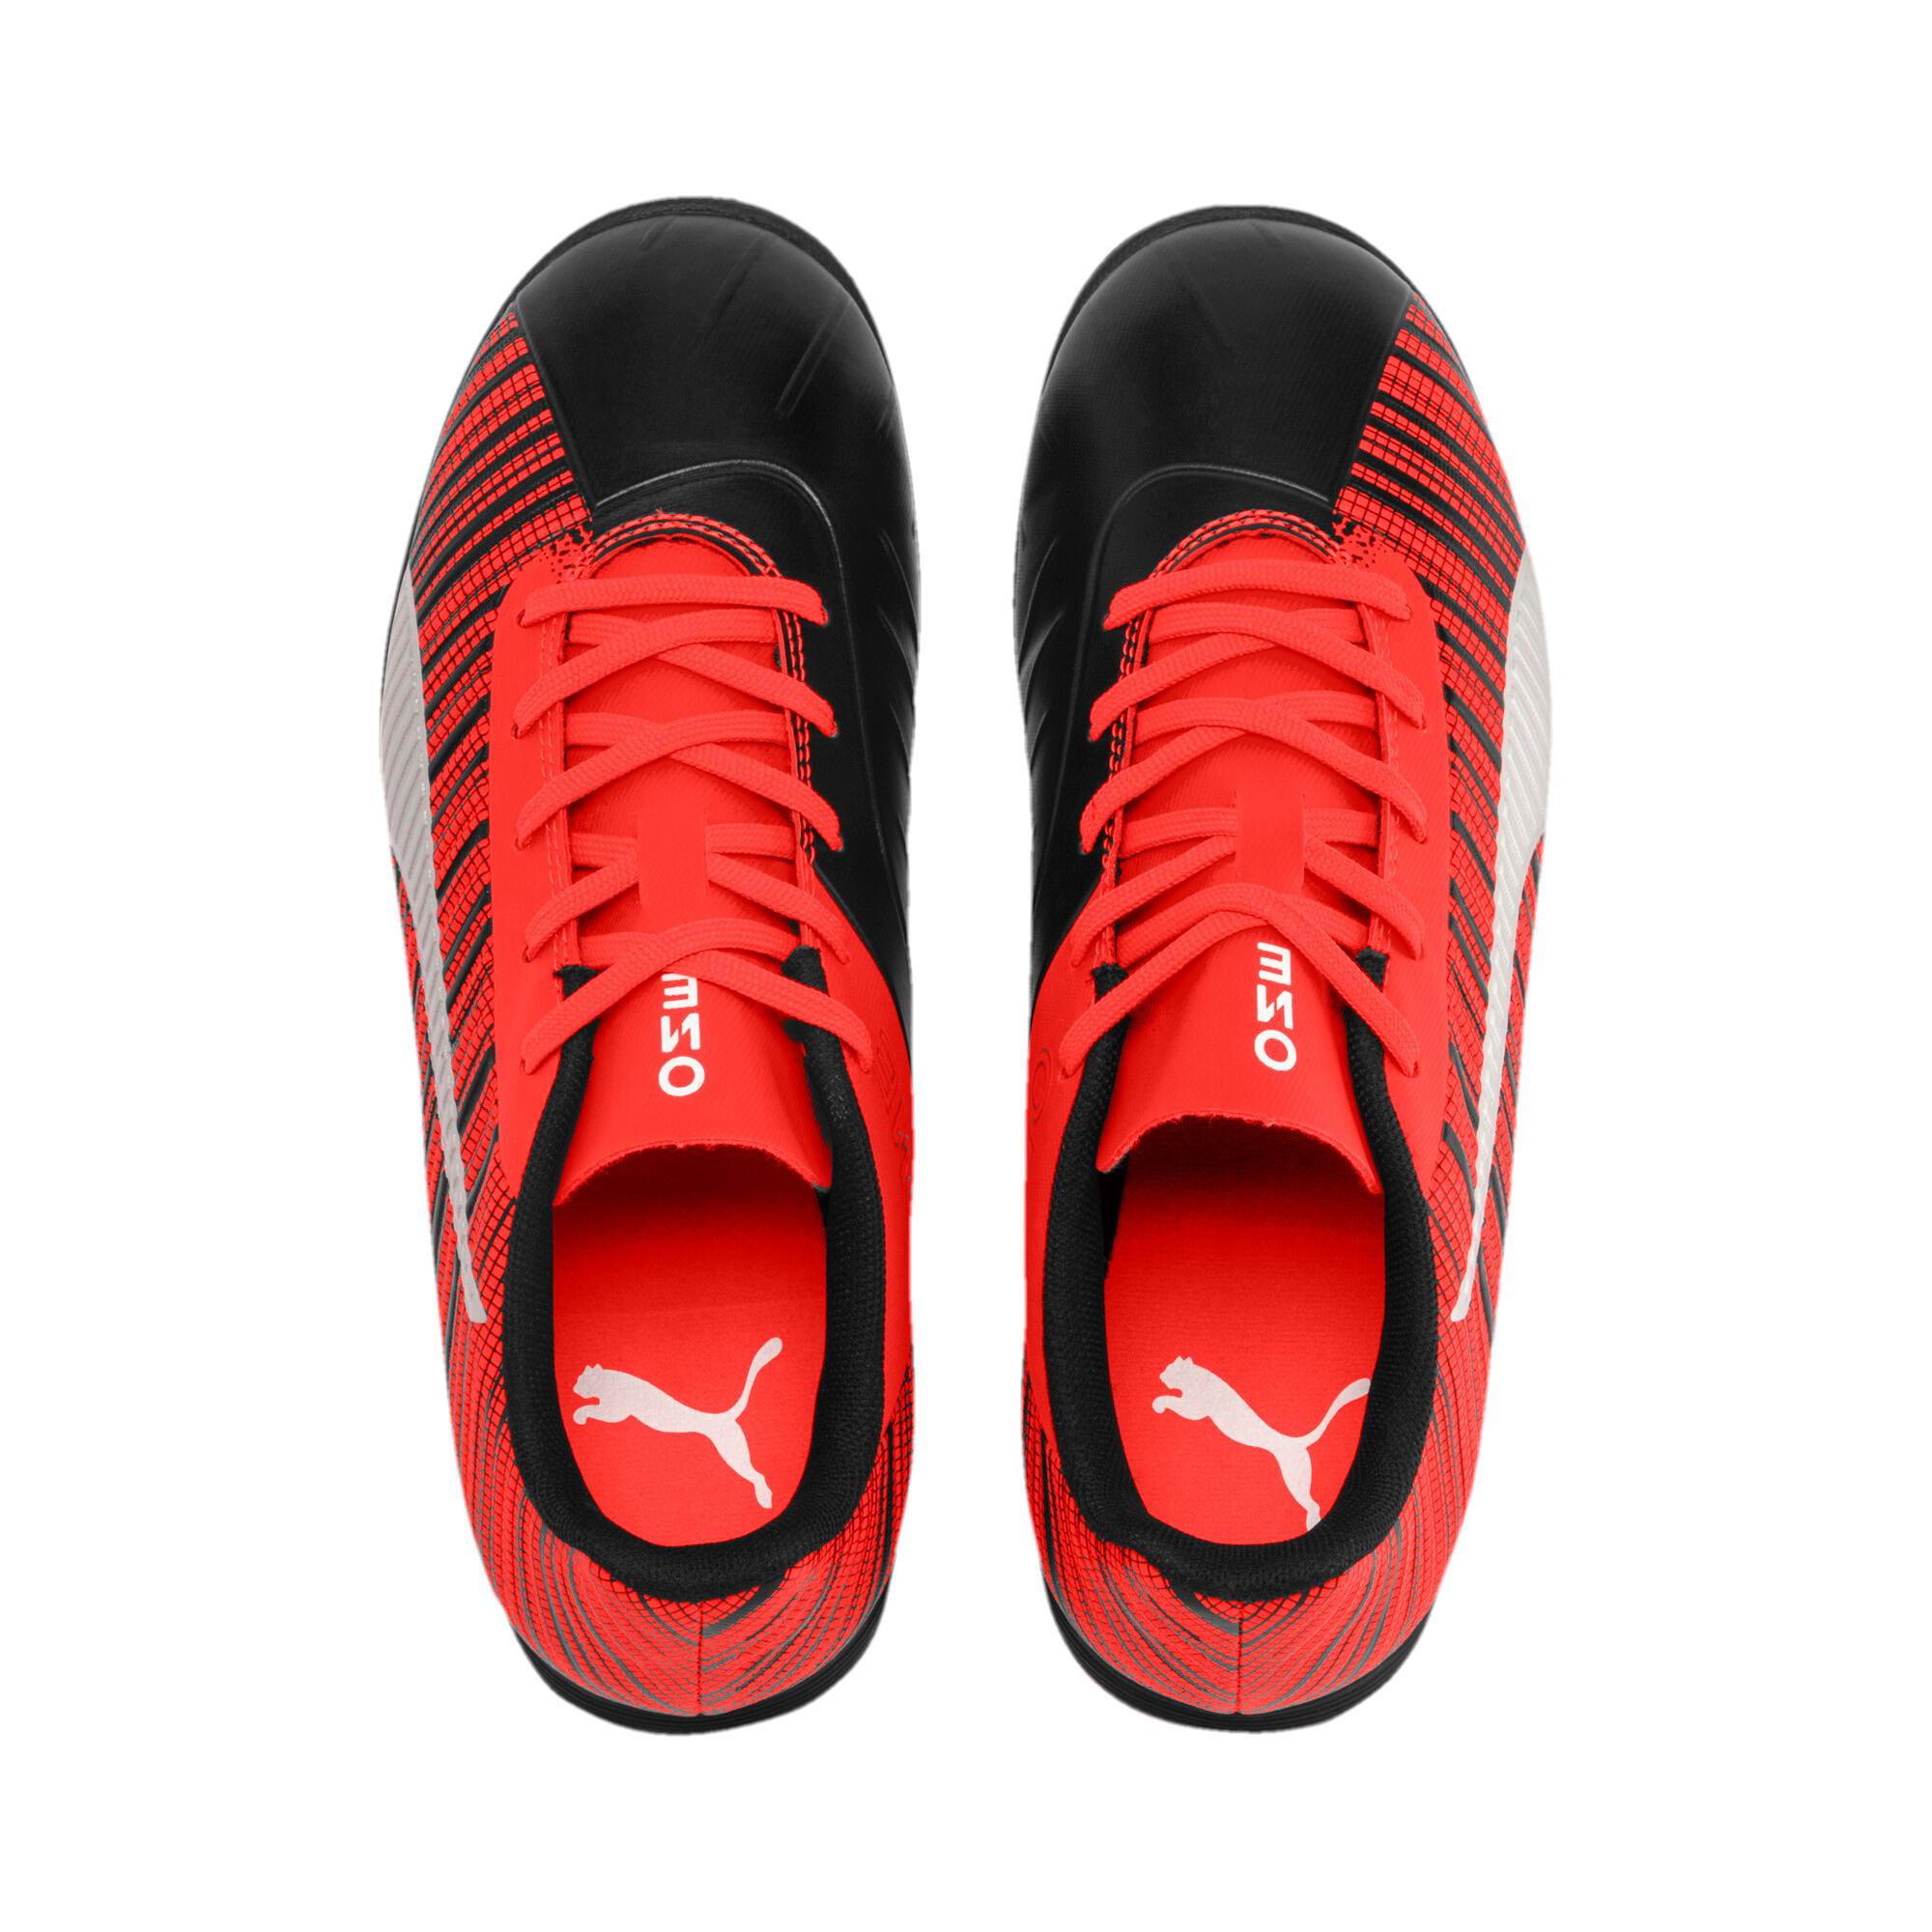 Thumbnail 6 of キッズ プーマ ワン 5.4 サッカー ターフトレーニング JR 18-24.5CM, Black-Nrgy Red-Aged Silver, medium-JPN